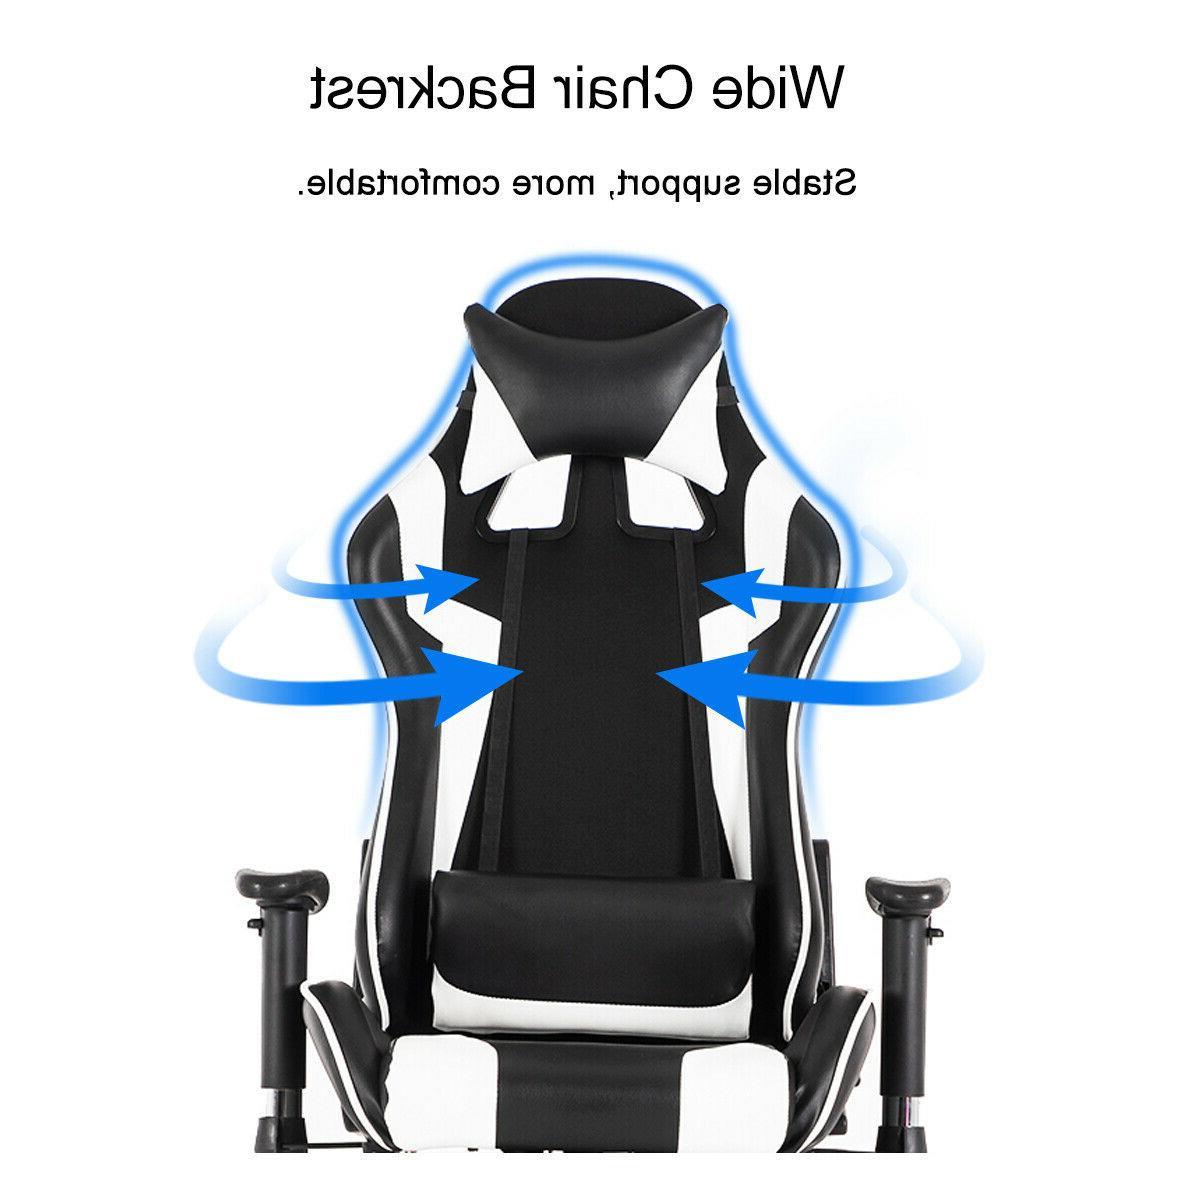 Racing Ergonomic Leather Swivel Office Desk